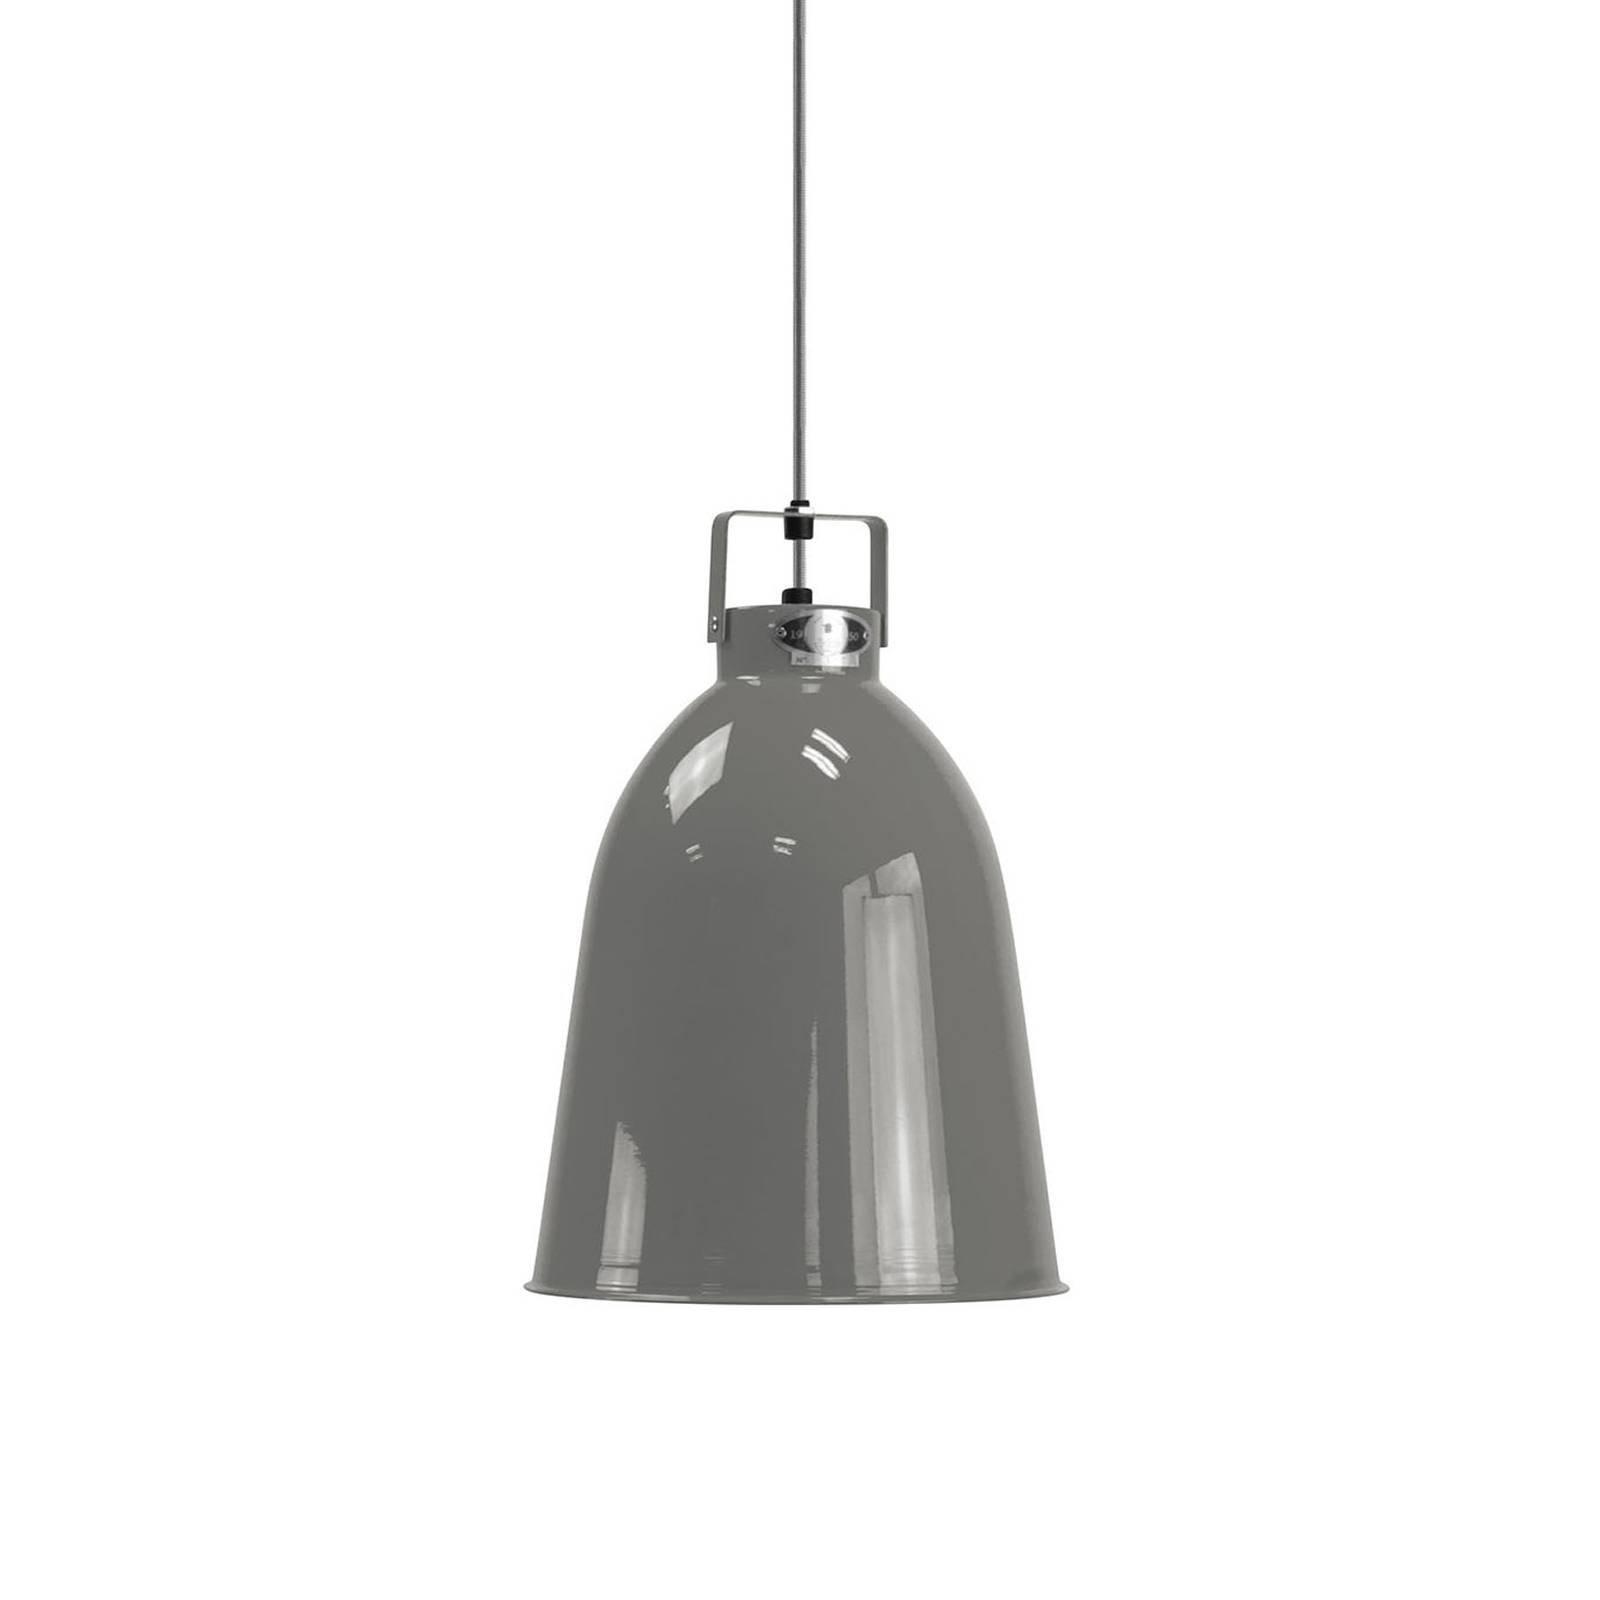 Jieldé Clément C240 hengelampe, blank grå, Ø24cm